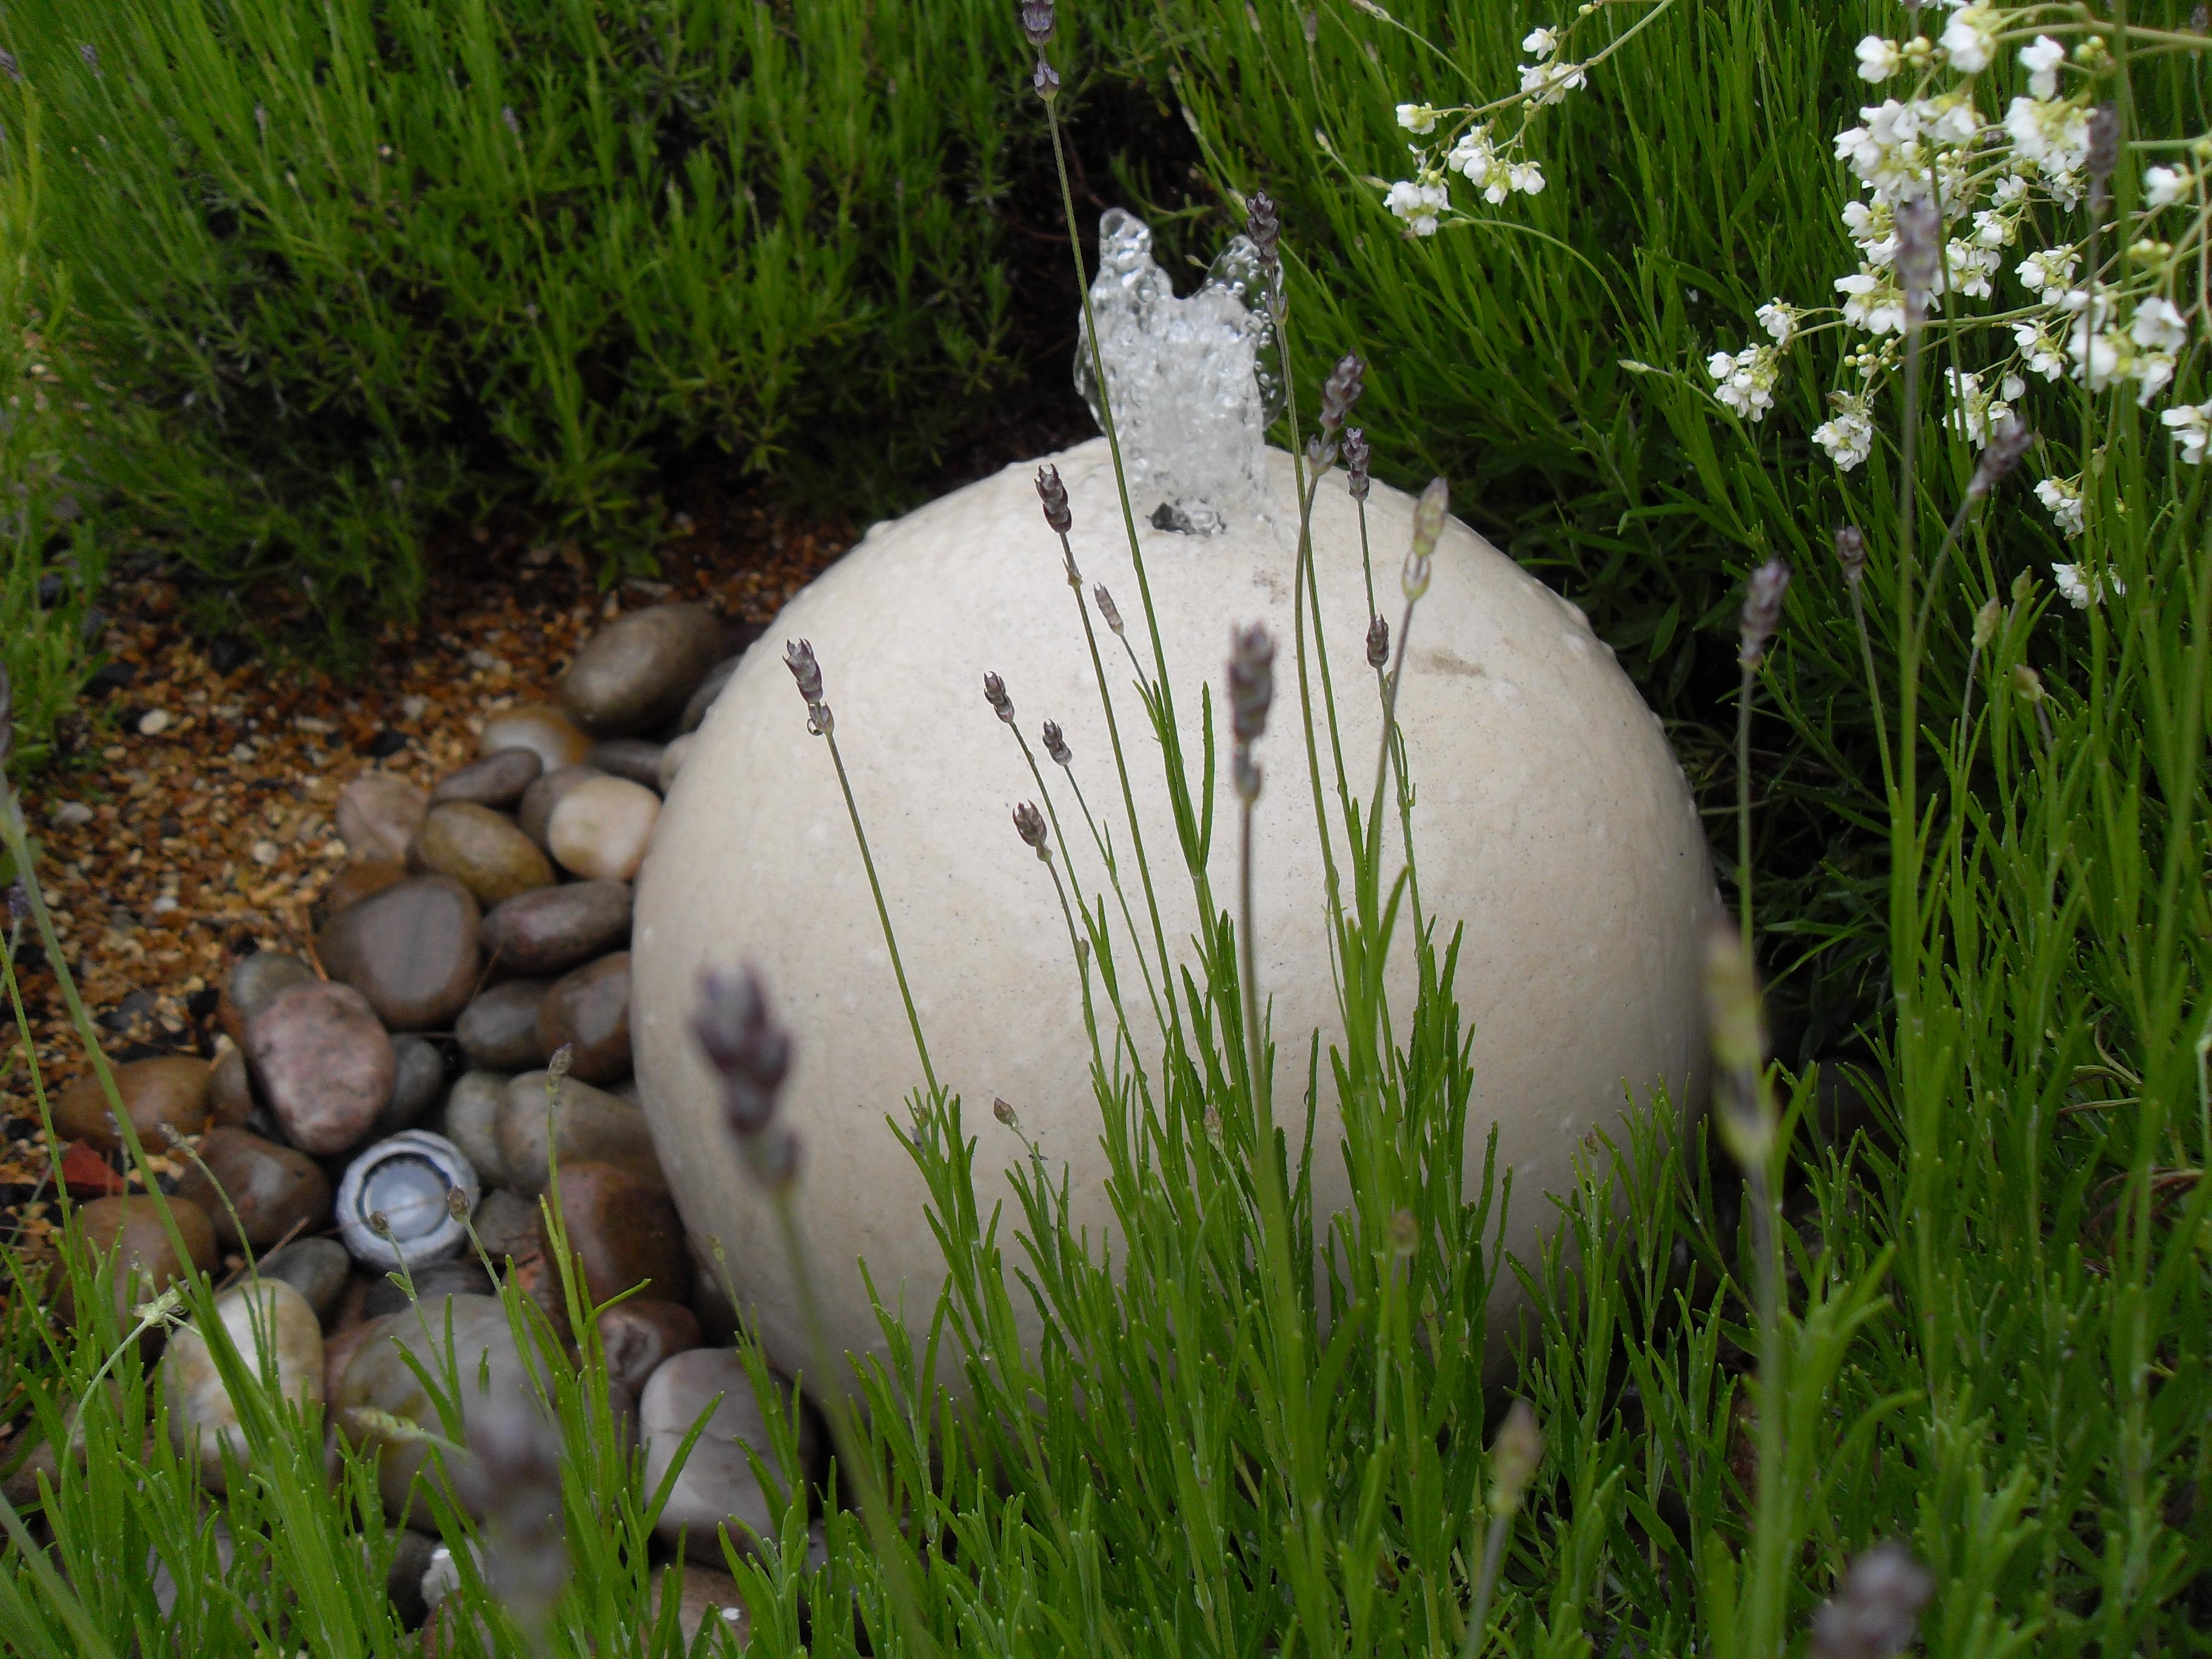 Waterfeature stone